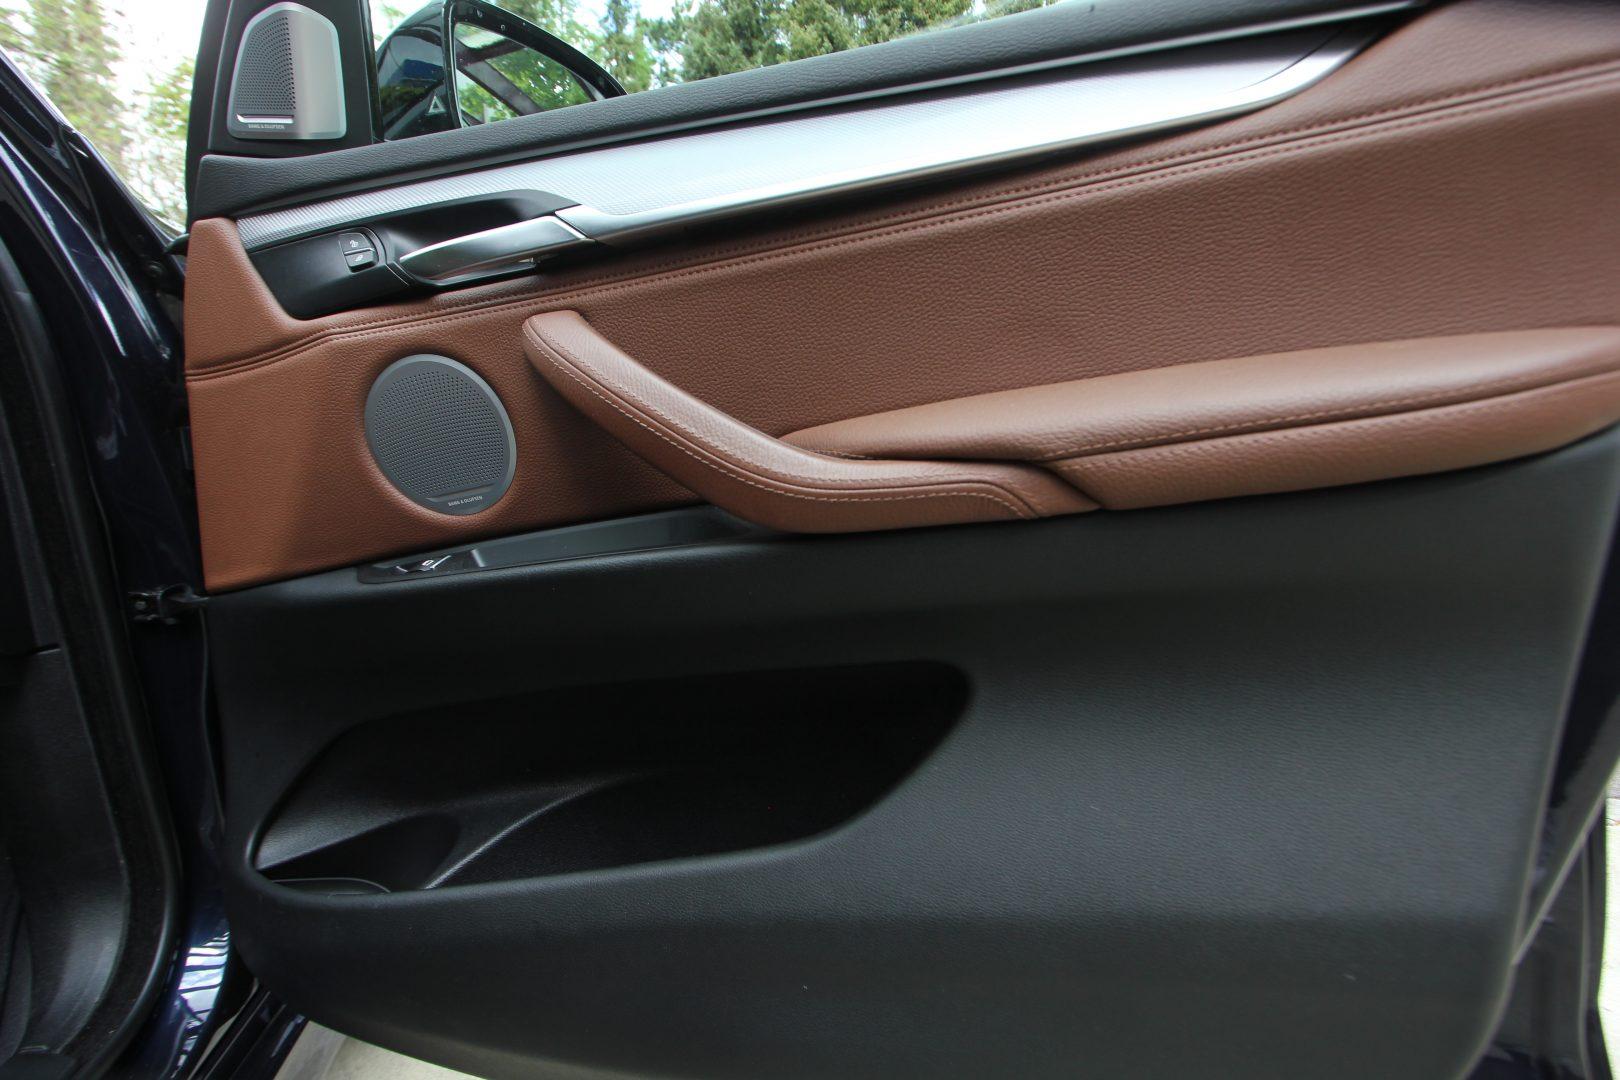 AIL BMW X5 M50d Bang & Olufsen Panorama RSE 15